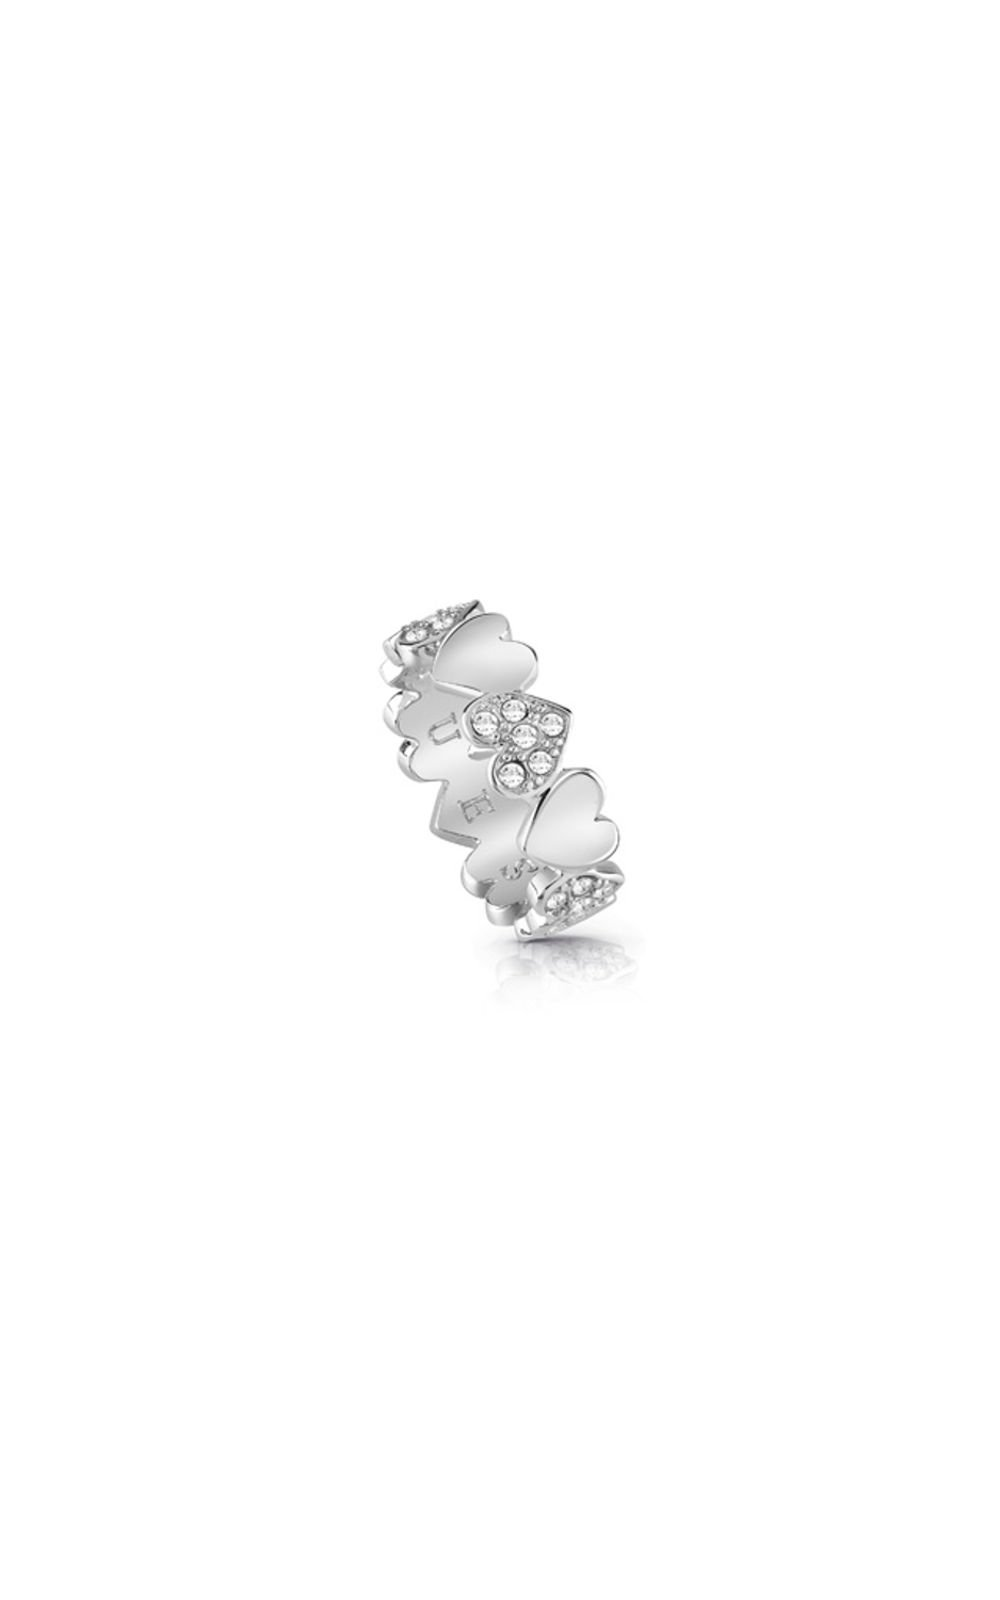 GUESS FAUX UBR85024-54 Ασημένιο Δαχτυλίδι Με Καρδιές